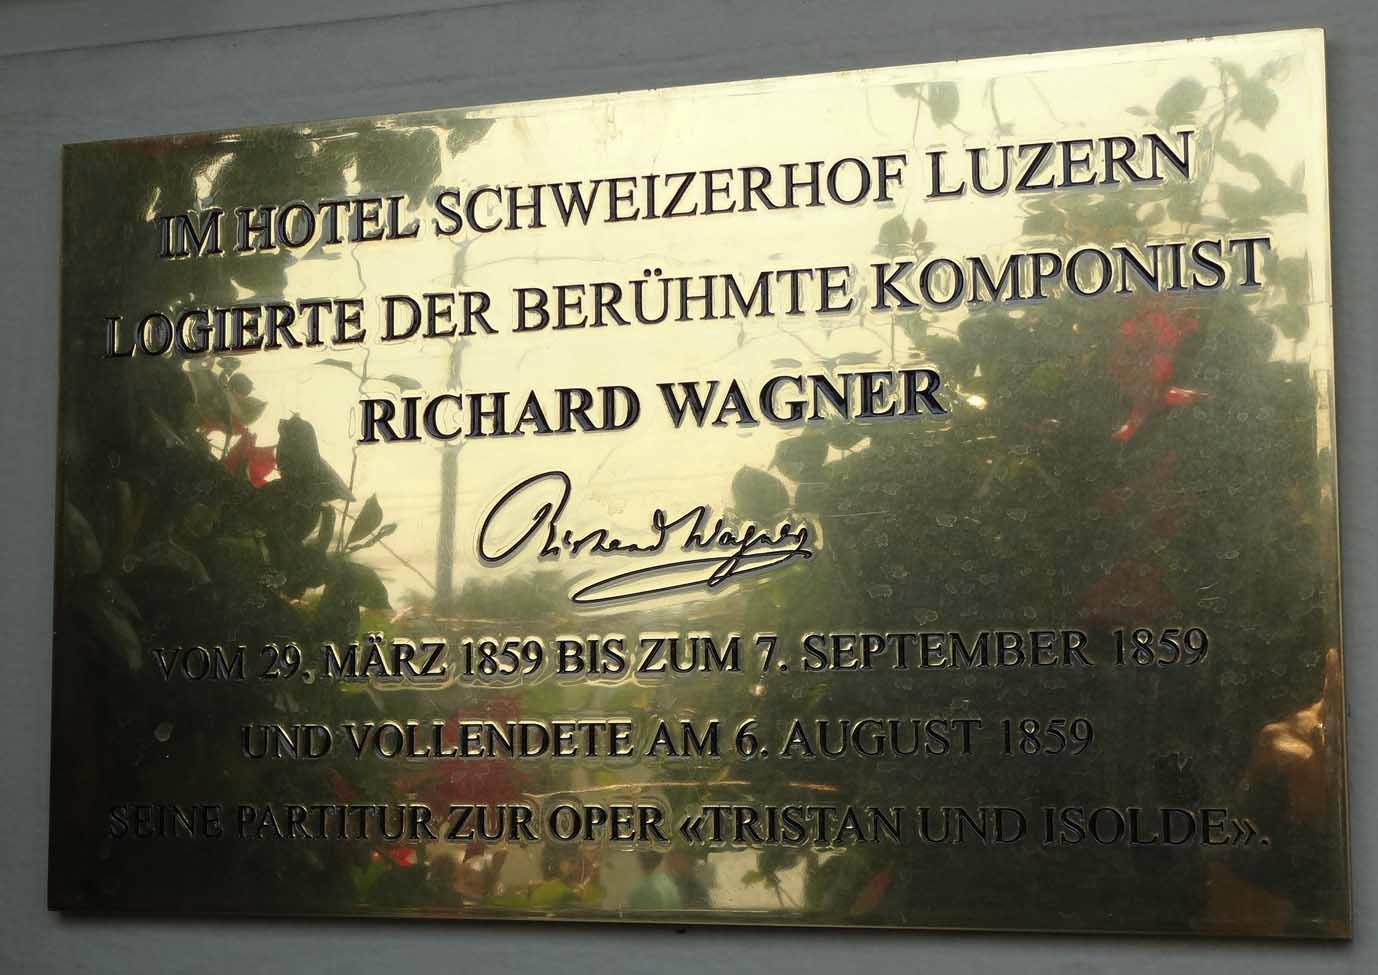 Plaque outside the Schweizerhof Hotel, Lucerne